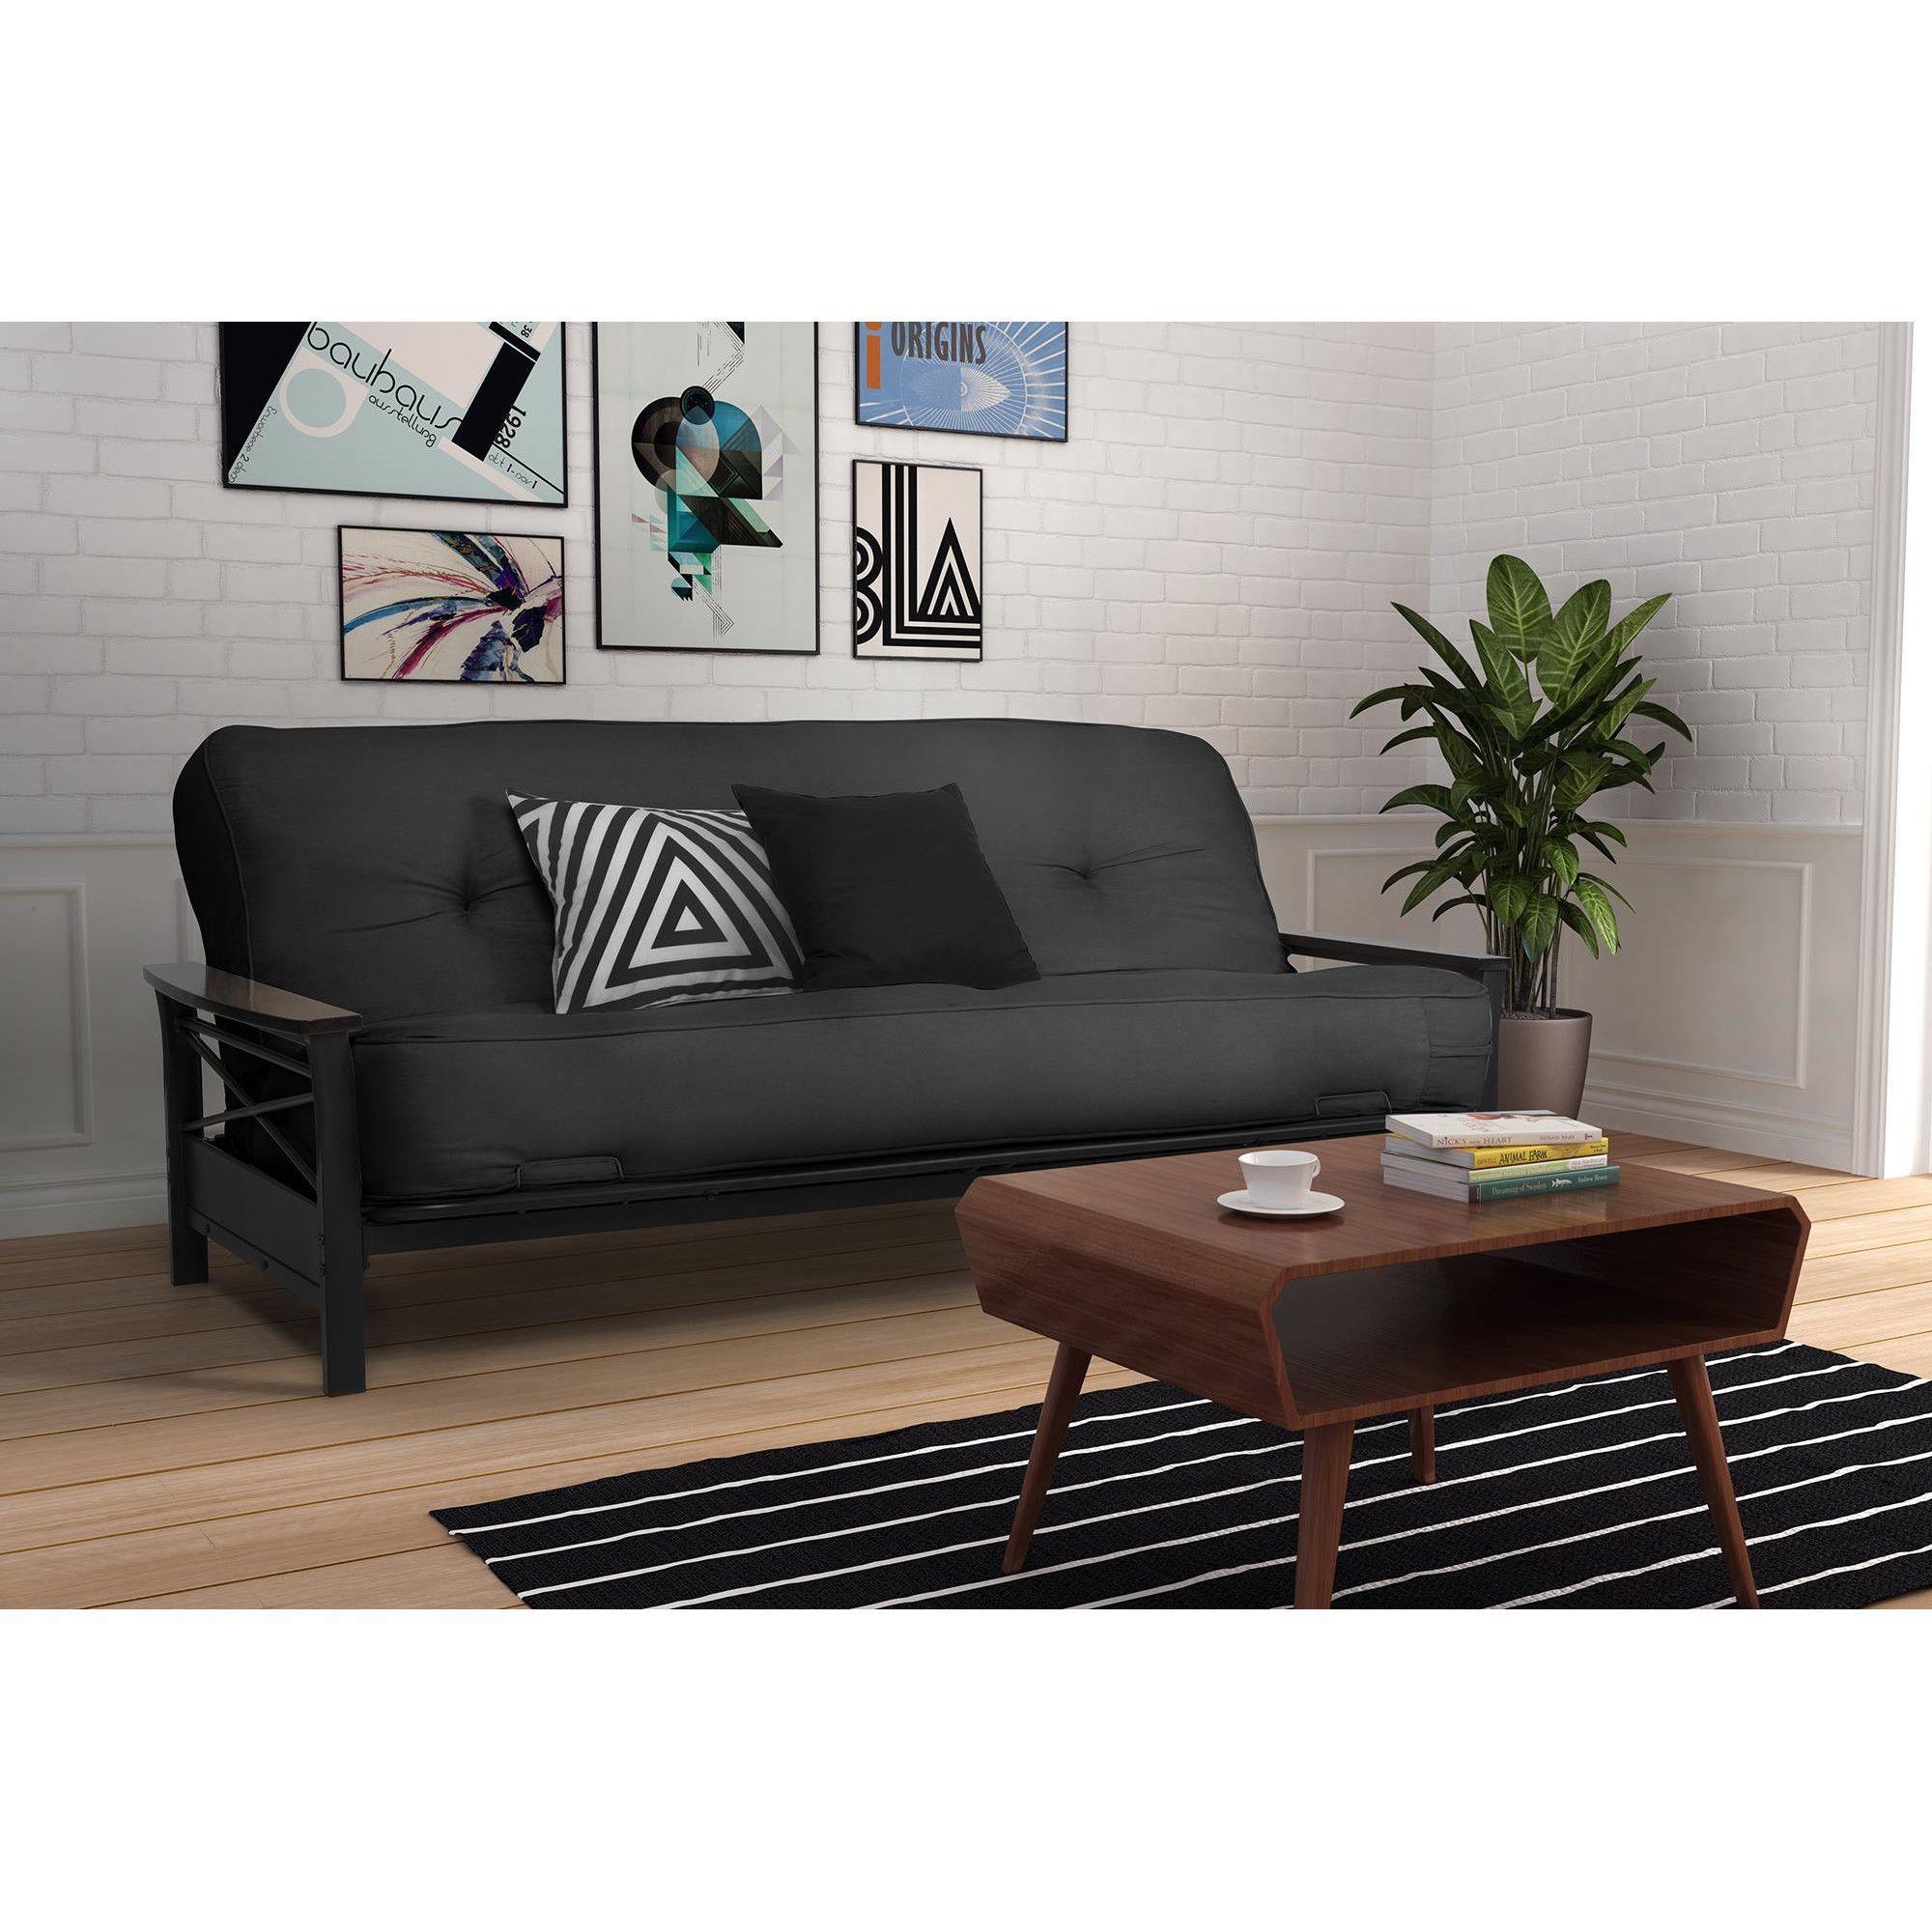 Convertible Small E Dorm Room Sleeper Sofa Futon With Innerspring Full Mattress